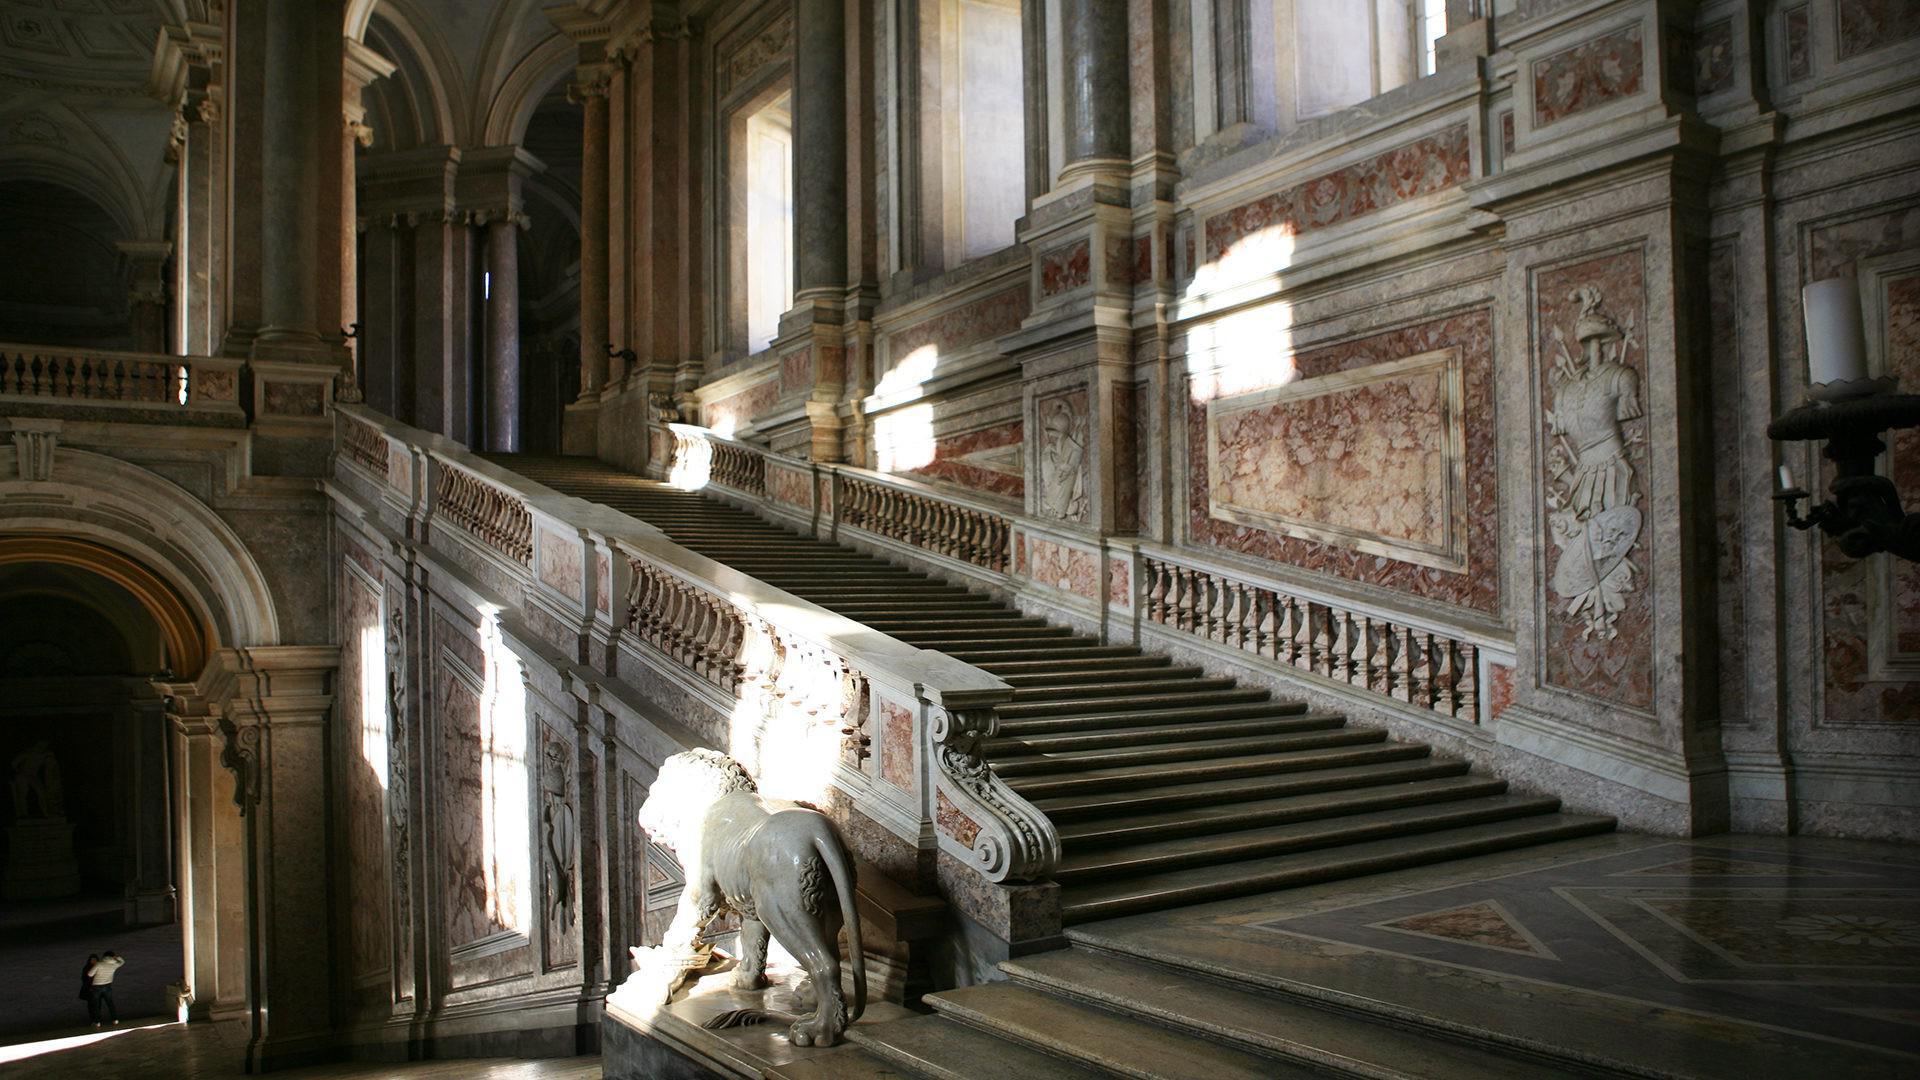 Reggia3 1920x1080 - Palacio Real de Caserta